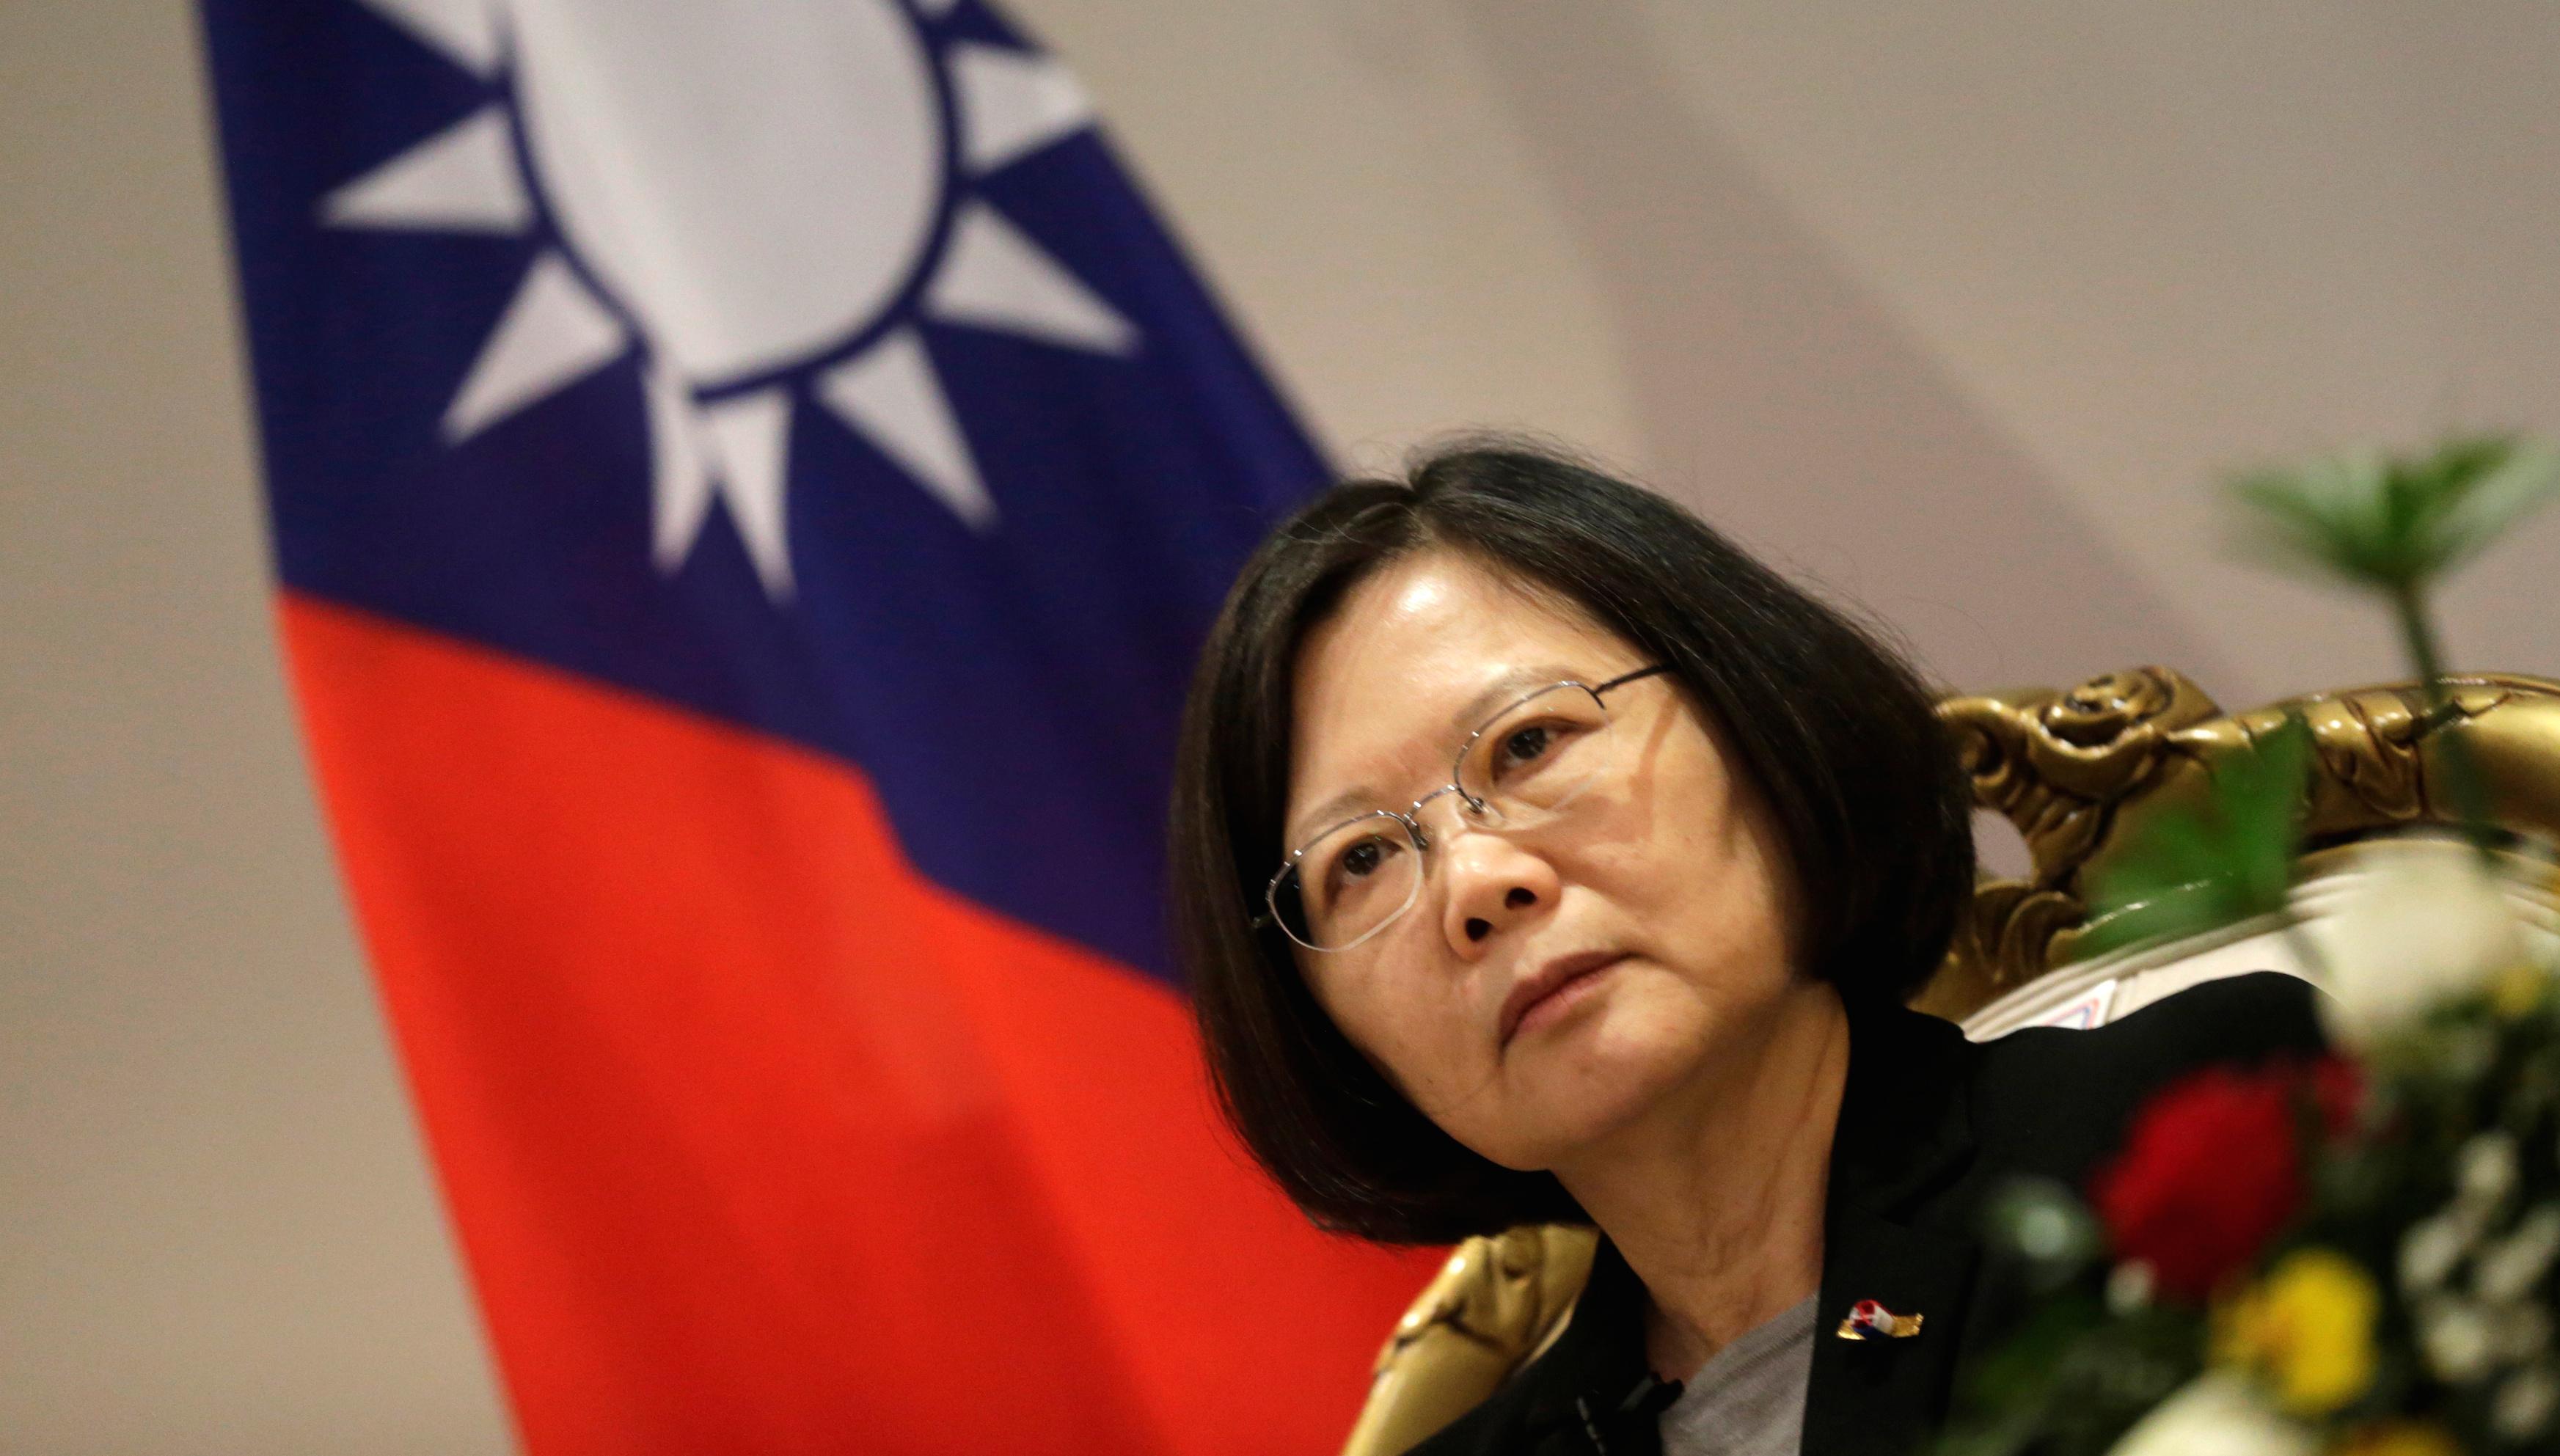 Taiwan's President Tsai Ing-wen speaks during an interview